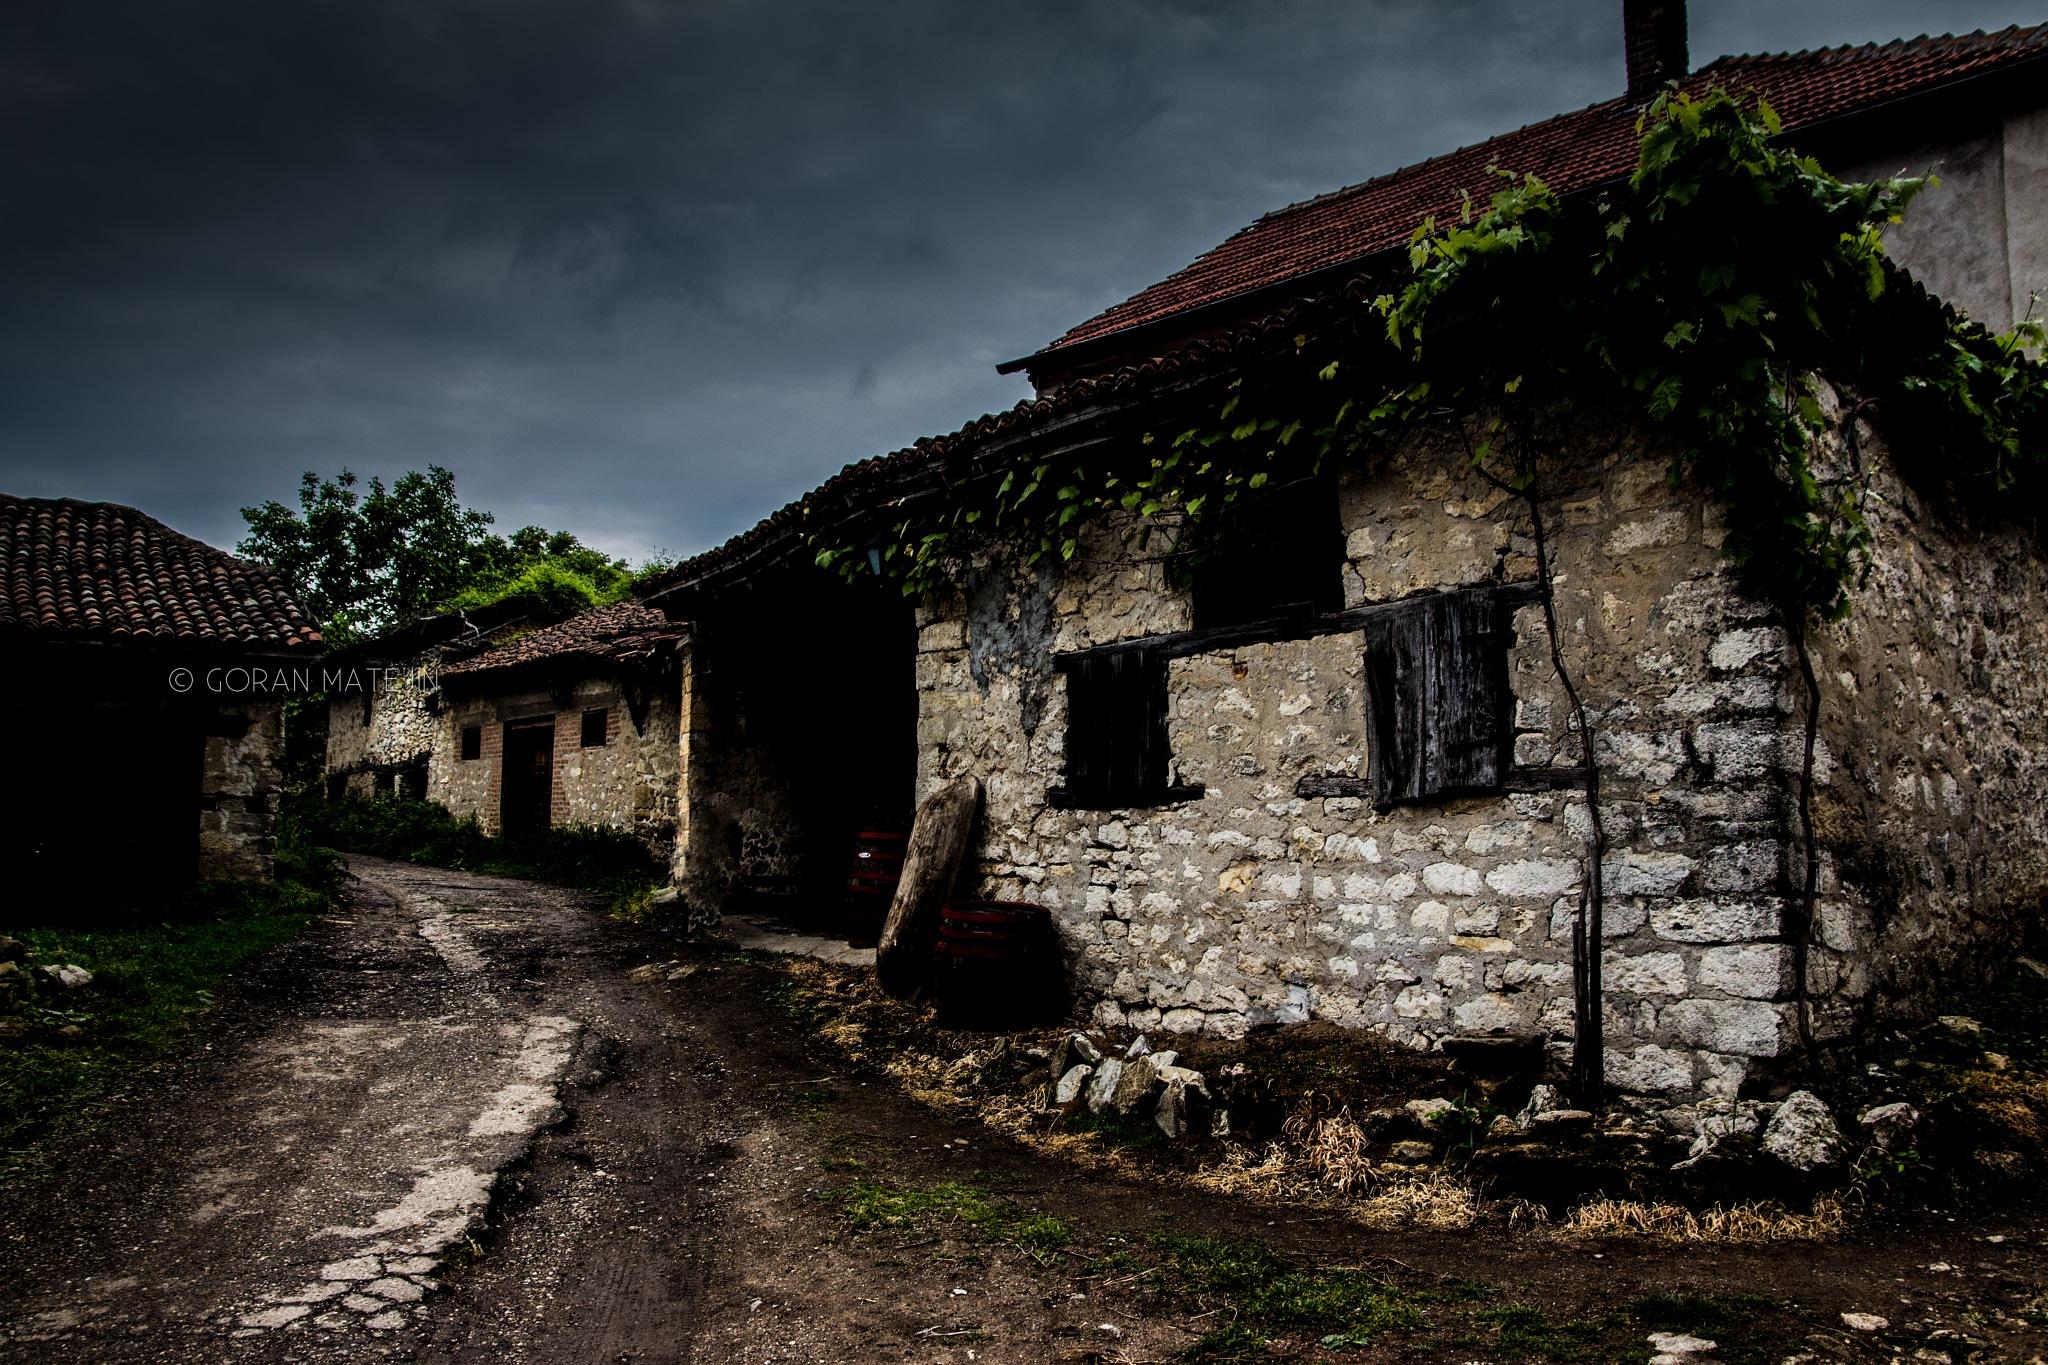 Old stone house by Goran Matejin